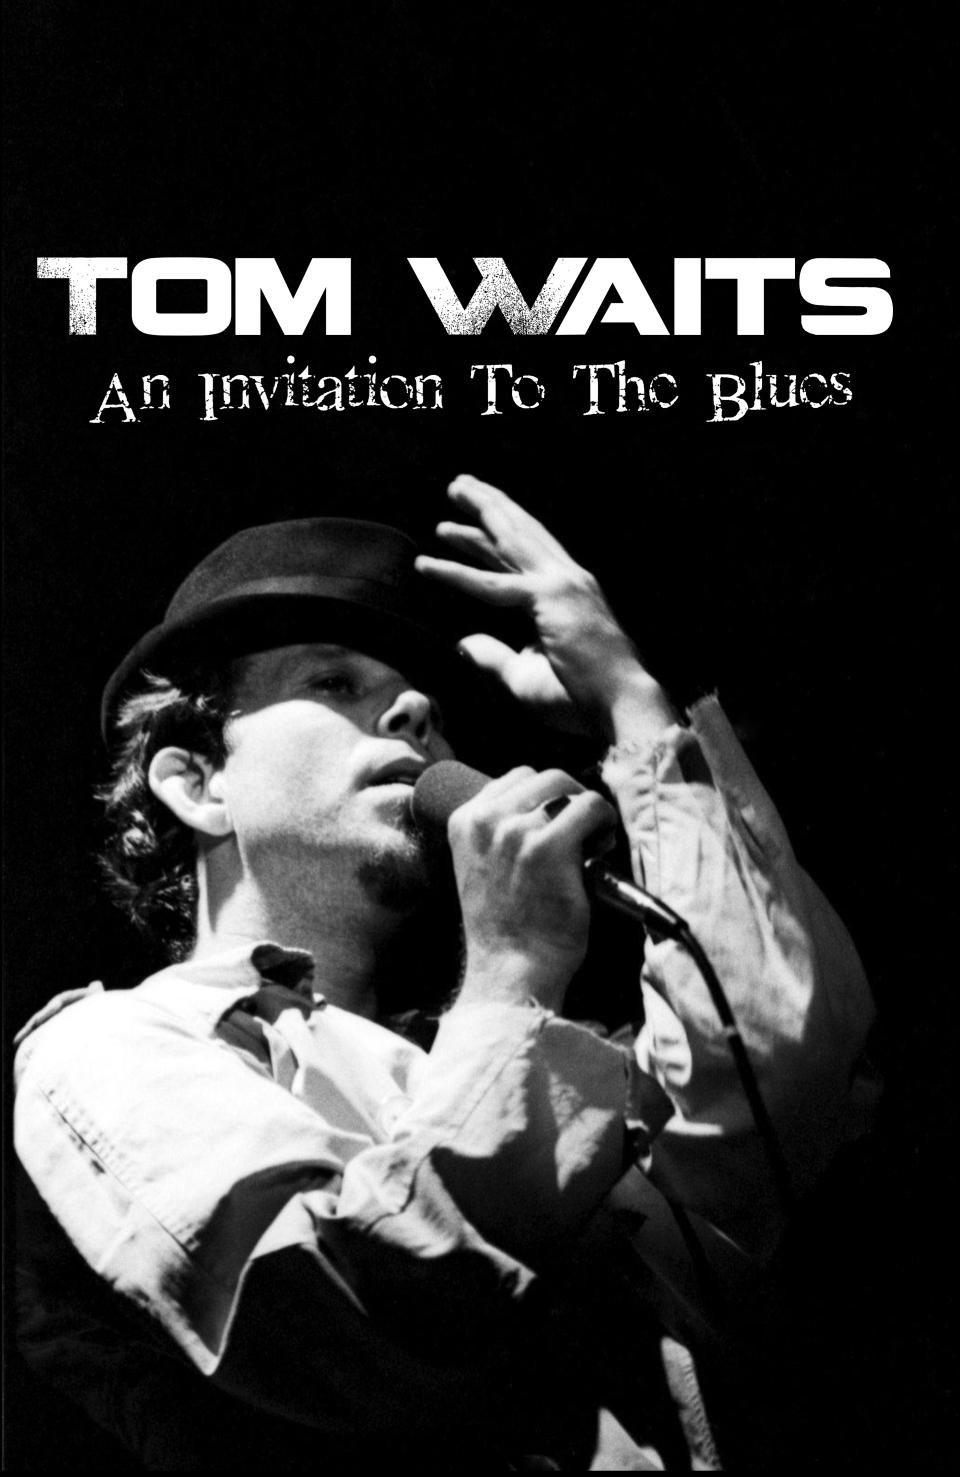 Tom waits an invitation to the blues amazon tom waits dvd tom waits an invitation to the blues amazon tom waits dvd blu ray stopboris Images